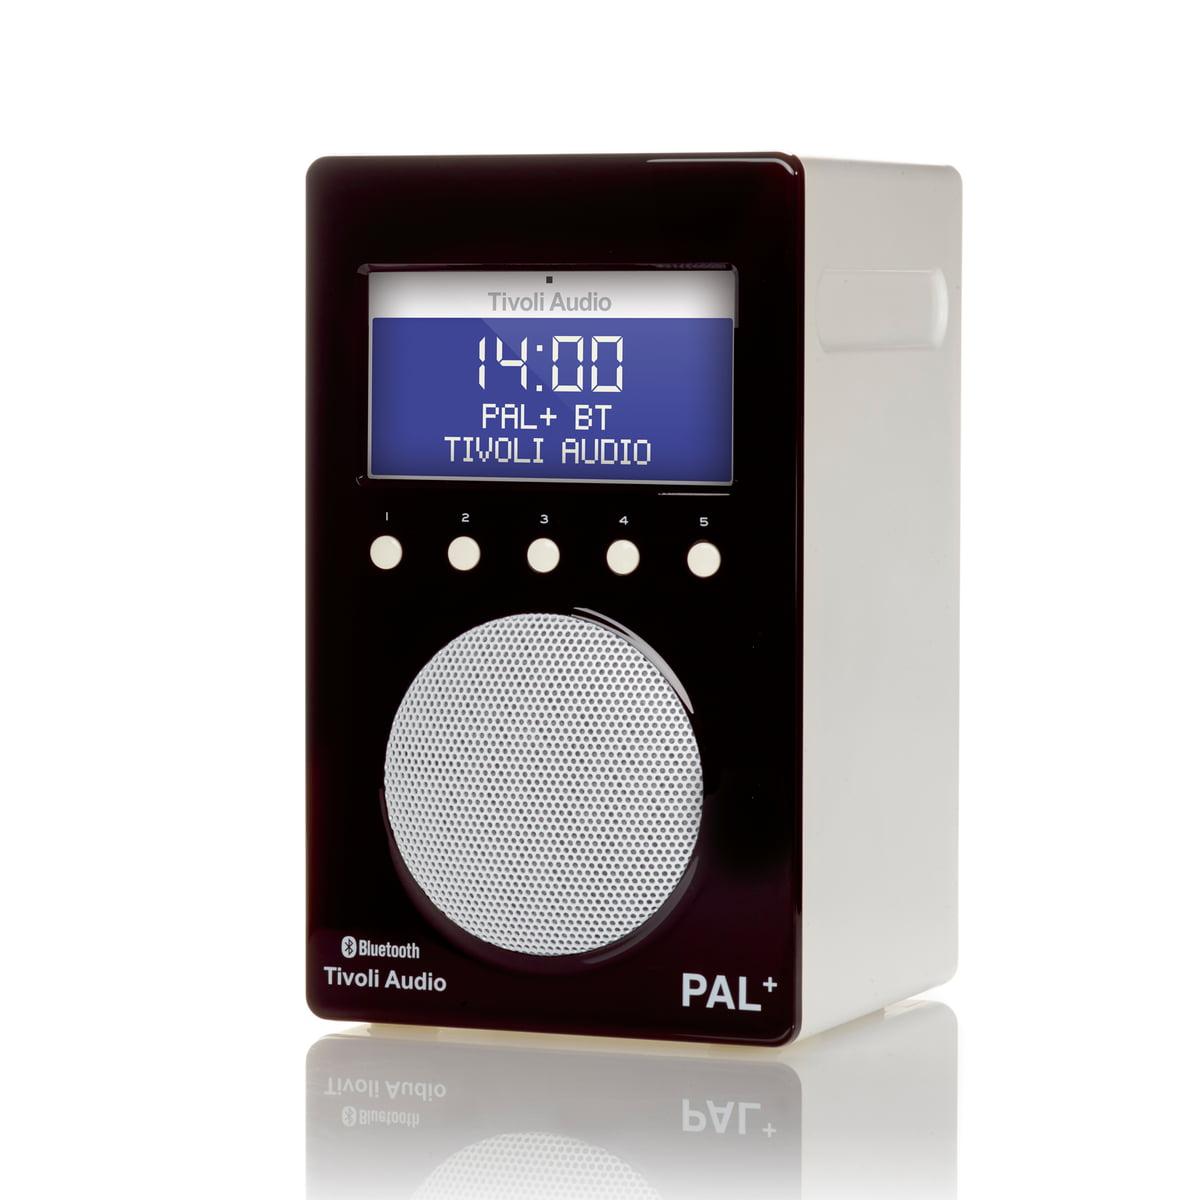 tivoli audio pal bt glossy black white - Tivoli Radio